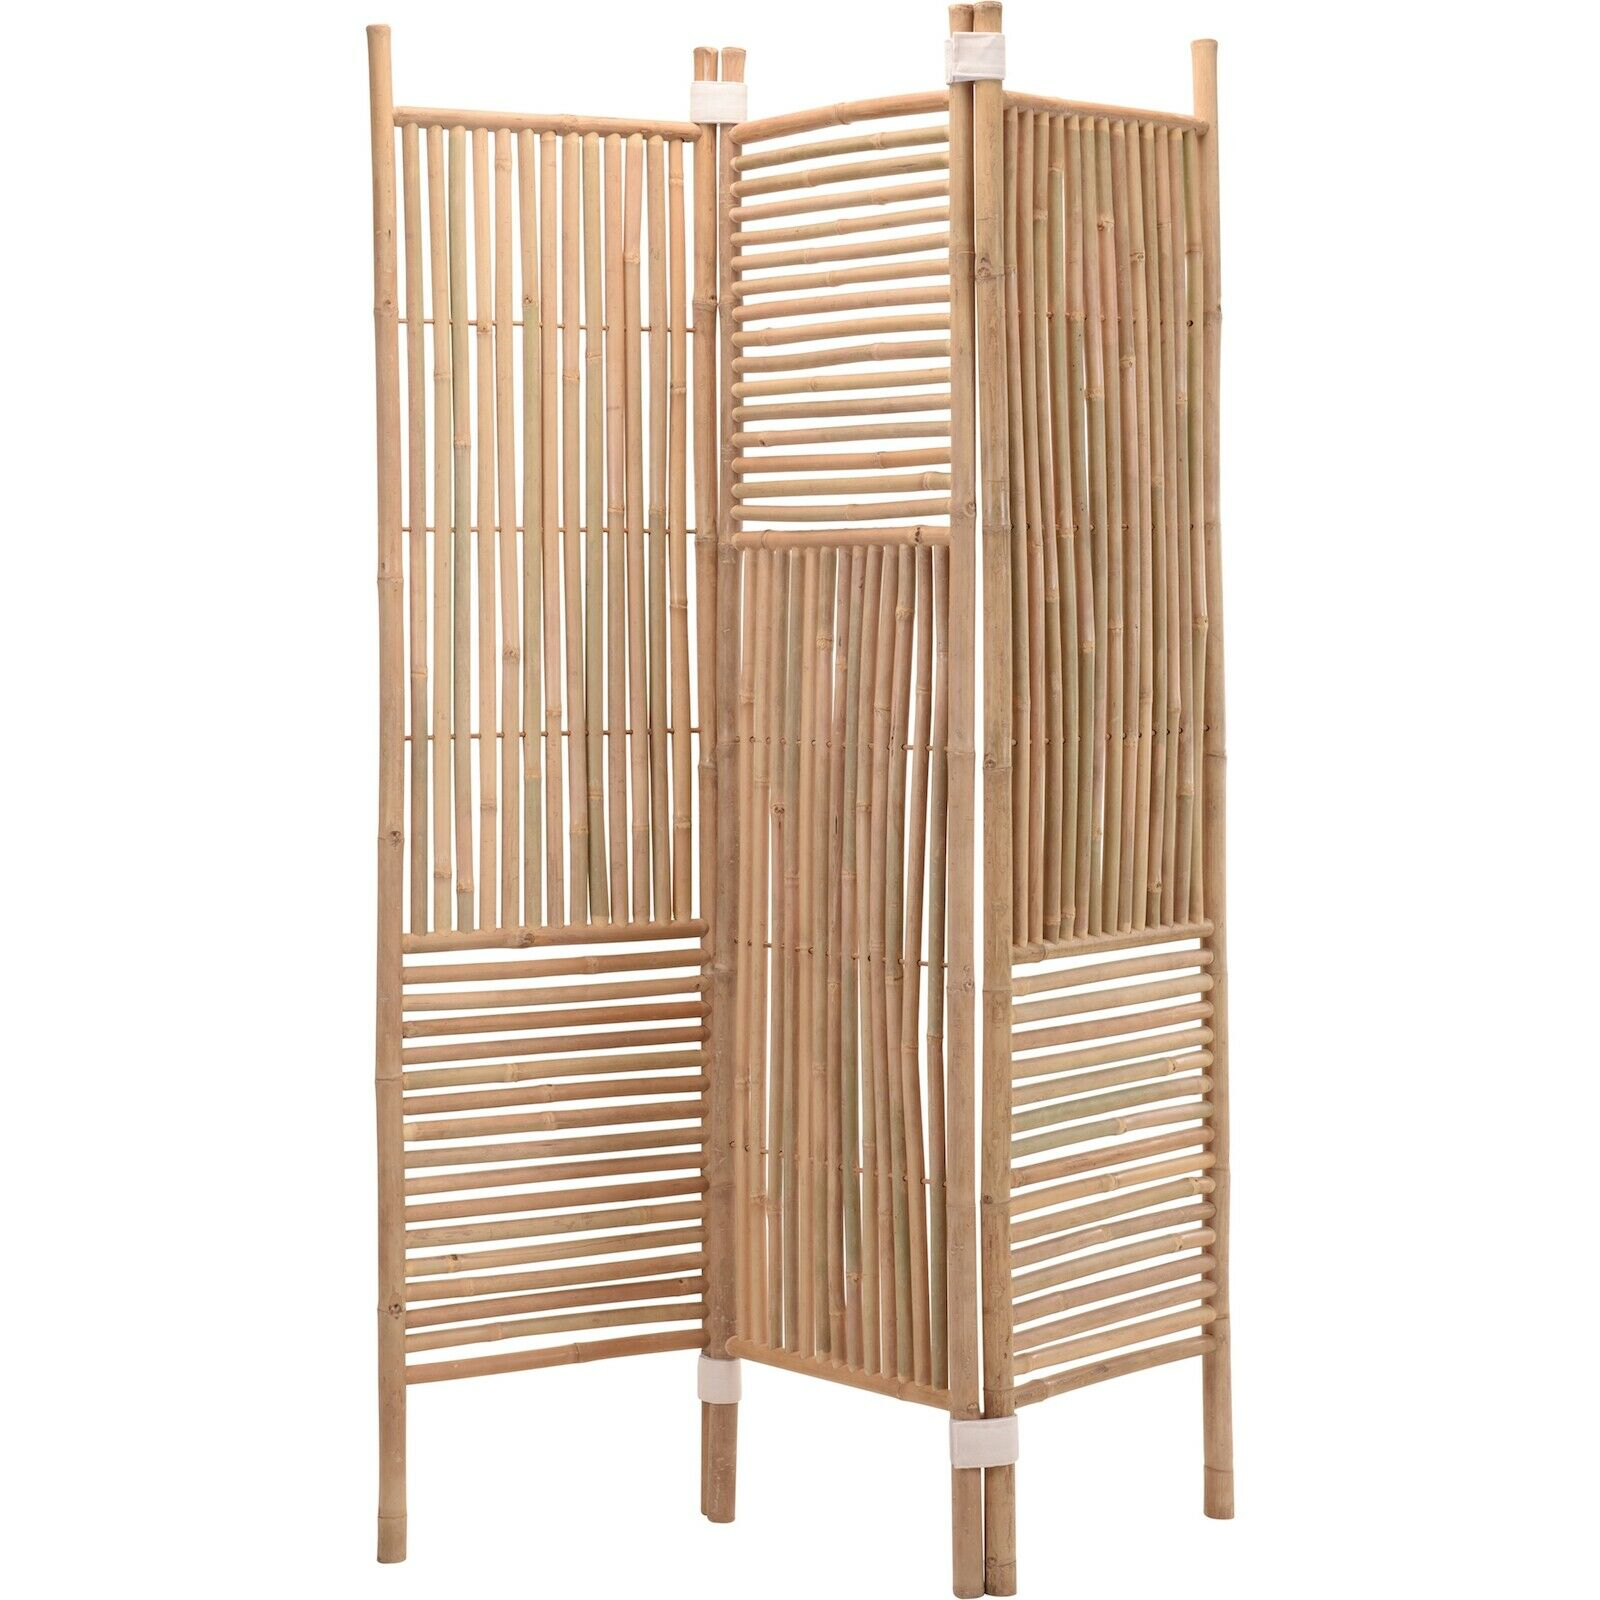 Full Size of Paravent Bambus Garten Bett Wohnzimmer Paravent Bambus